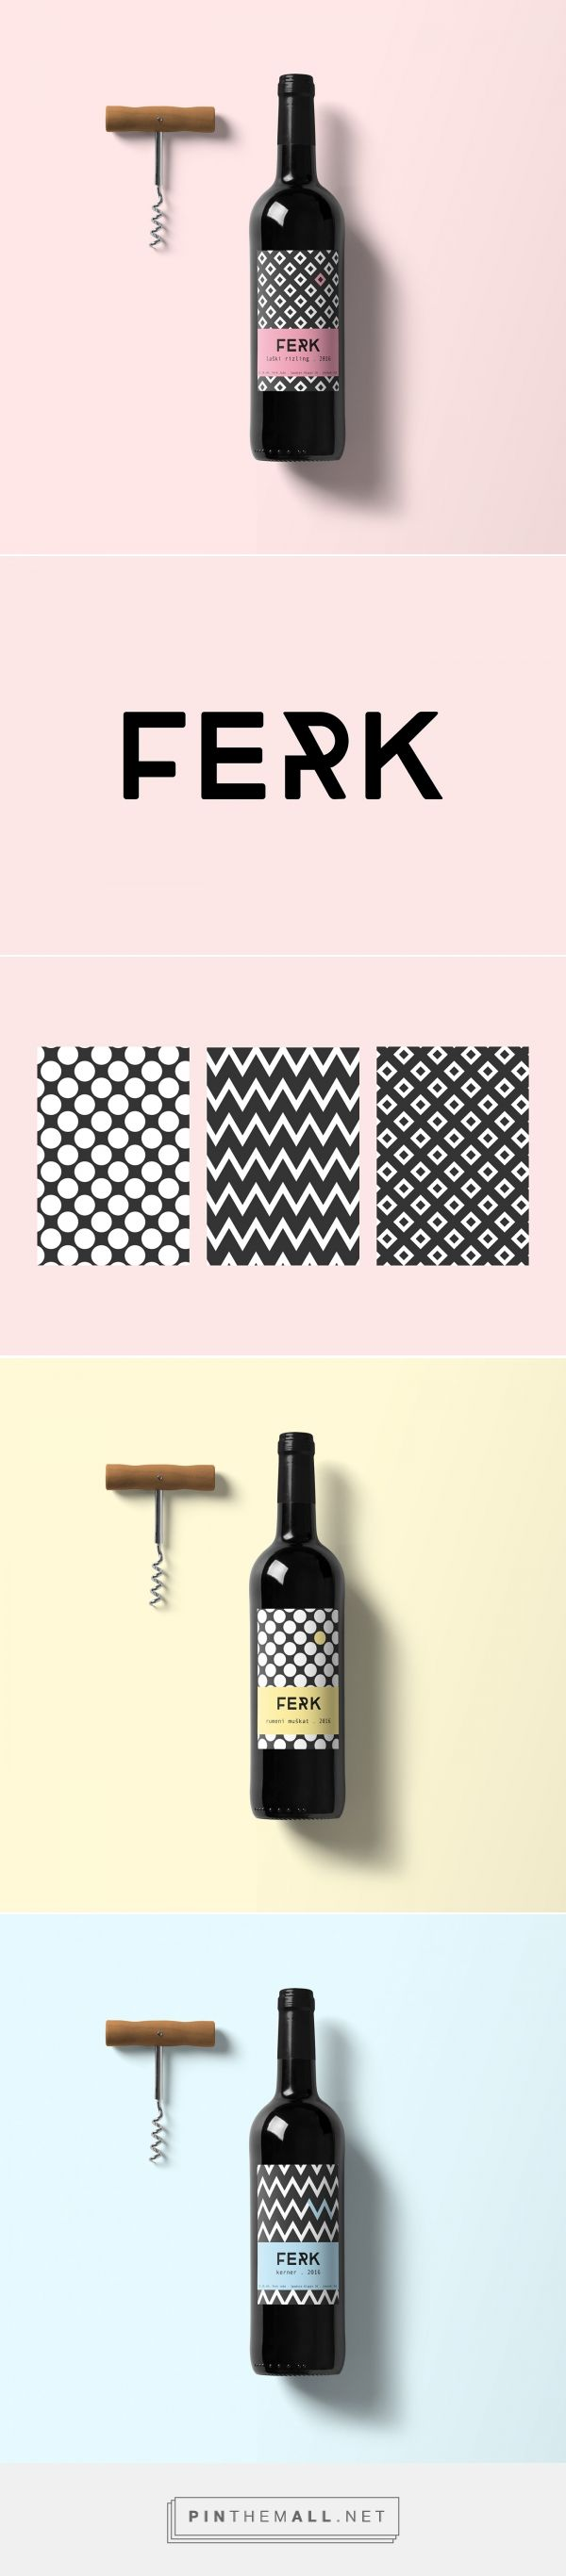 Ferk Wine Packaging by Claudia Kvar   Fivestar Branding Agency – Design and Branding Agency & Curated Inspiration Gallery